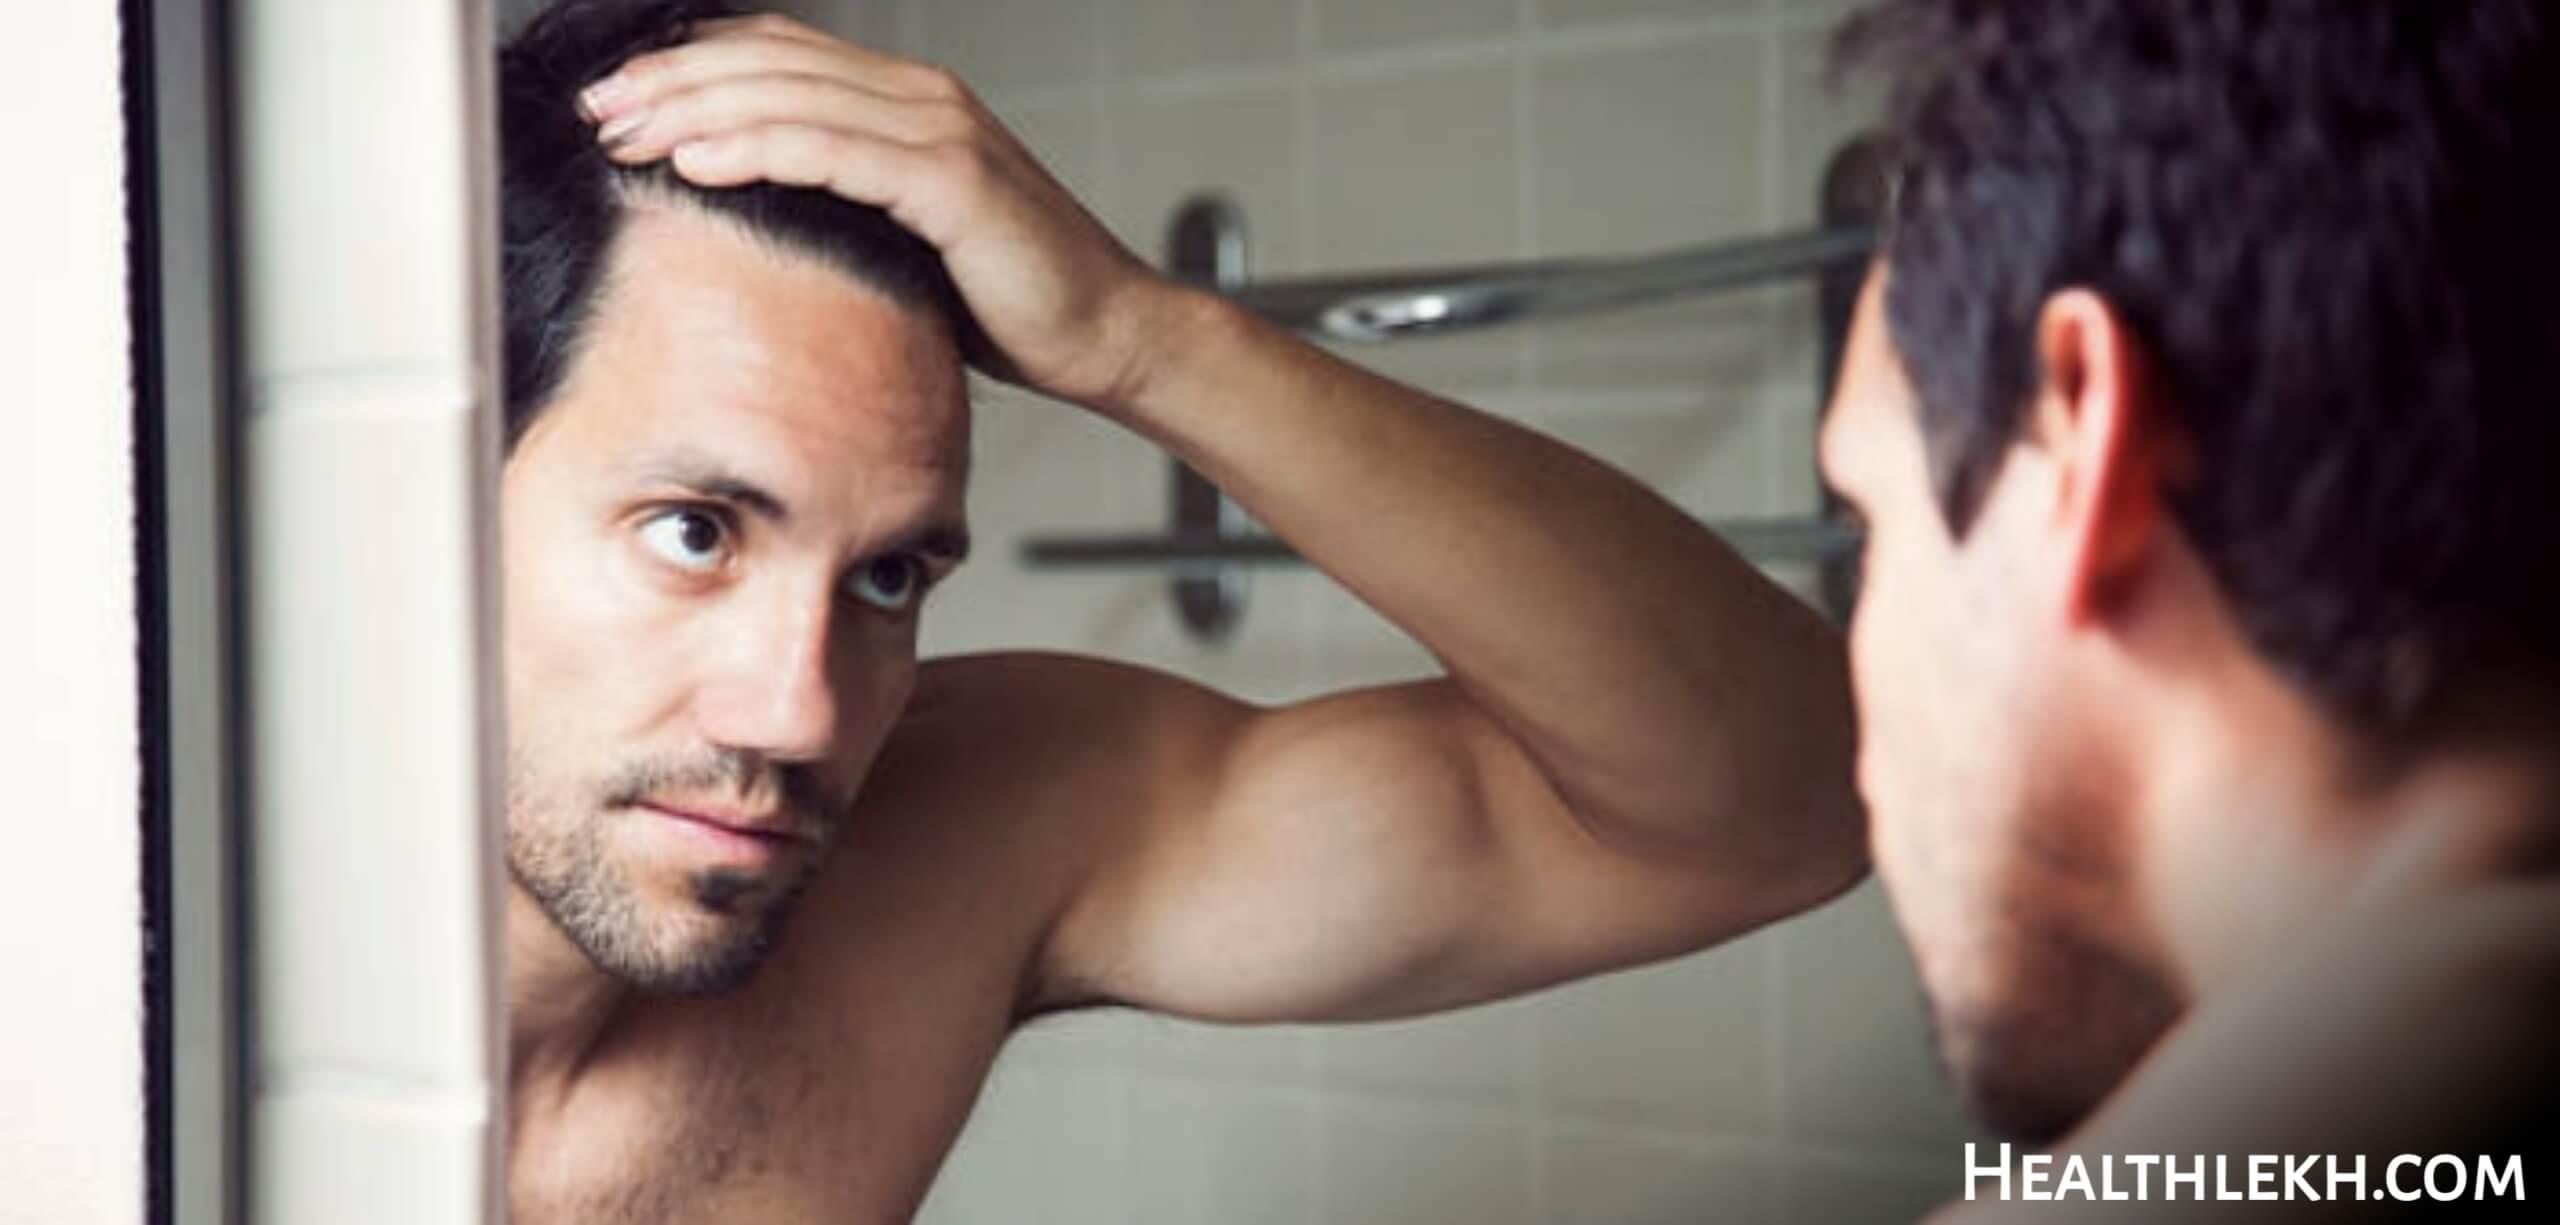 सफेद बाल काले करने के घरेलू उपाय,Safed baal Kale Kaise Kare,white hair black kaise kare,Home remedies for Grey hair in Hindi,safedbal kalekare